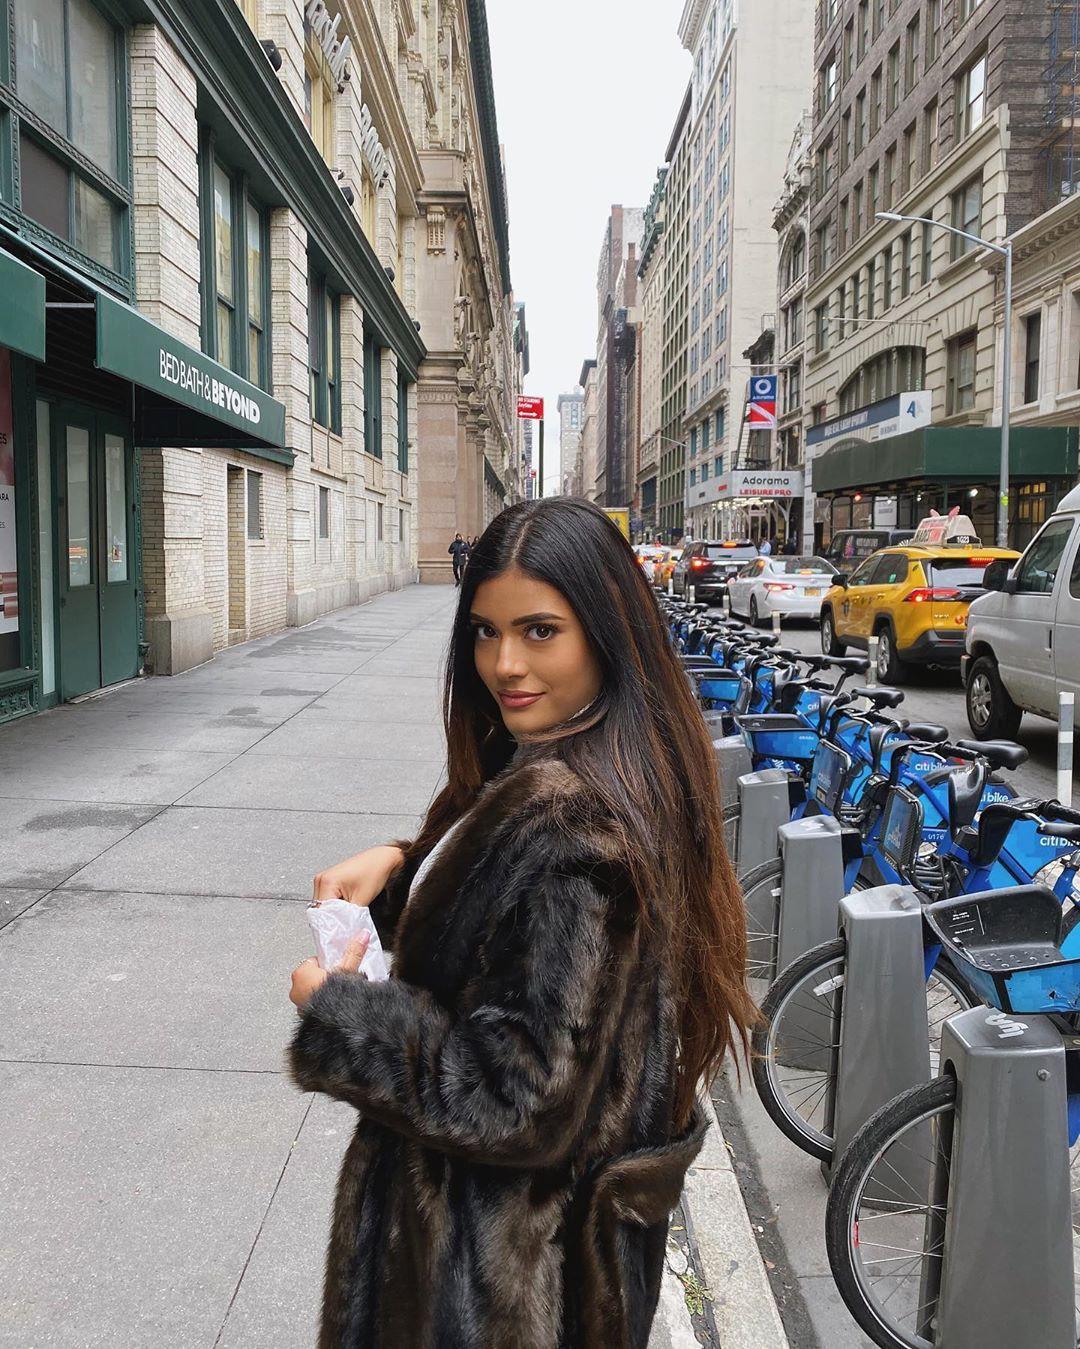 Daniella Salvi girls instagram photos, Long Hair Women, Hairstyle For Girls